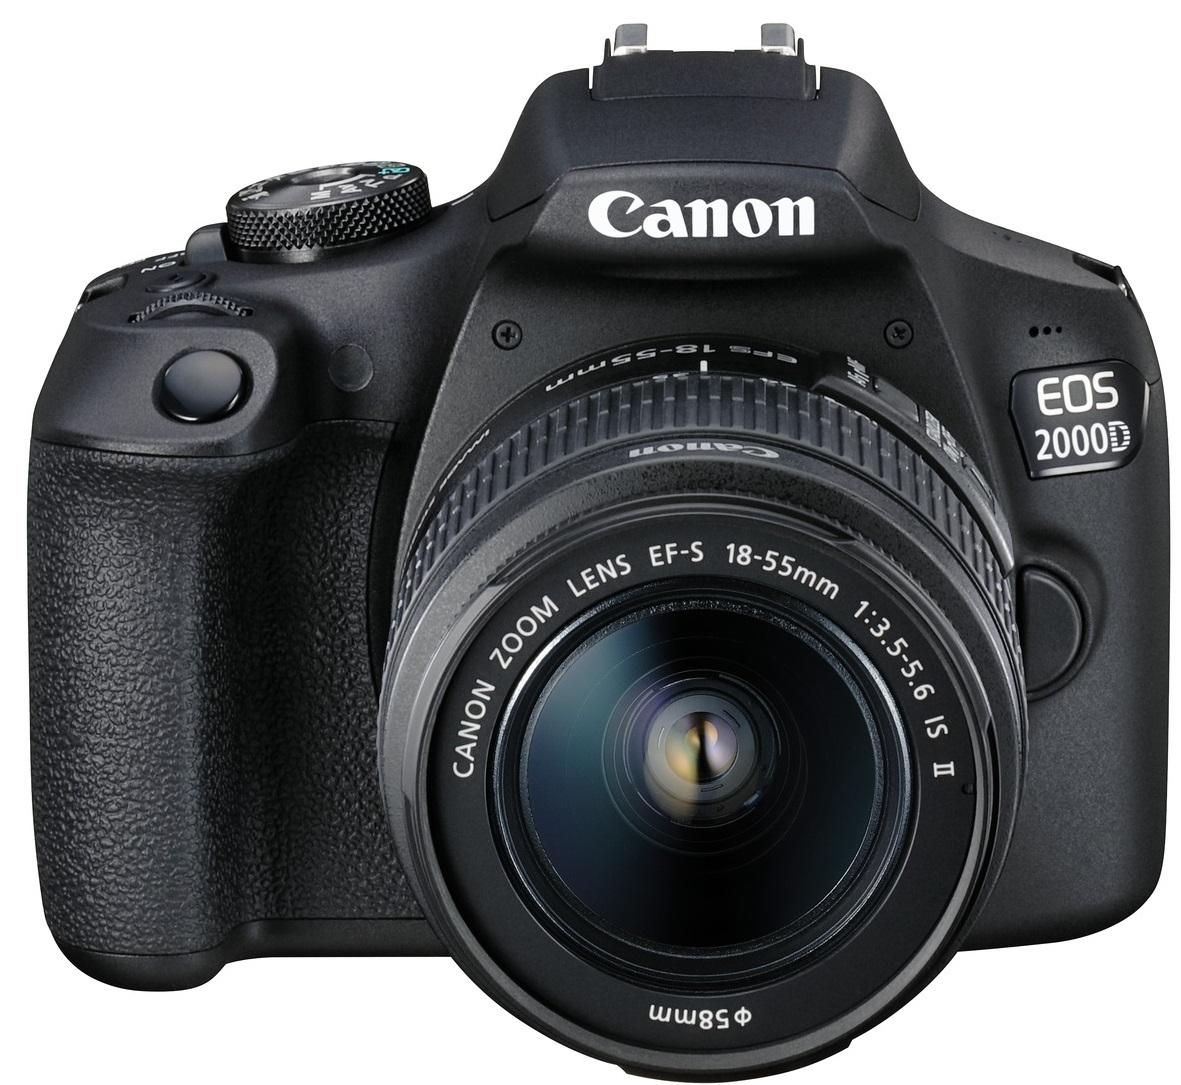 CANON EOS 2000D + 18-55 mm IS II